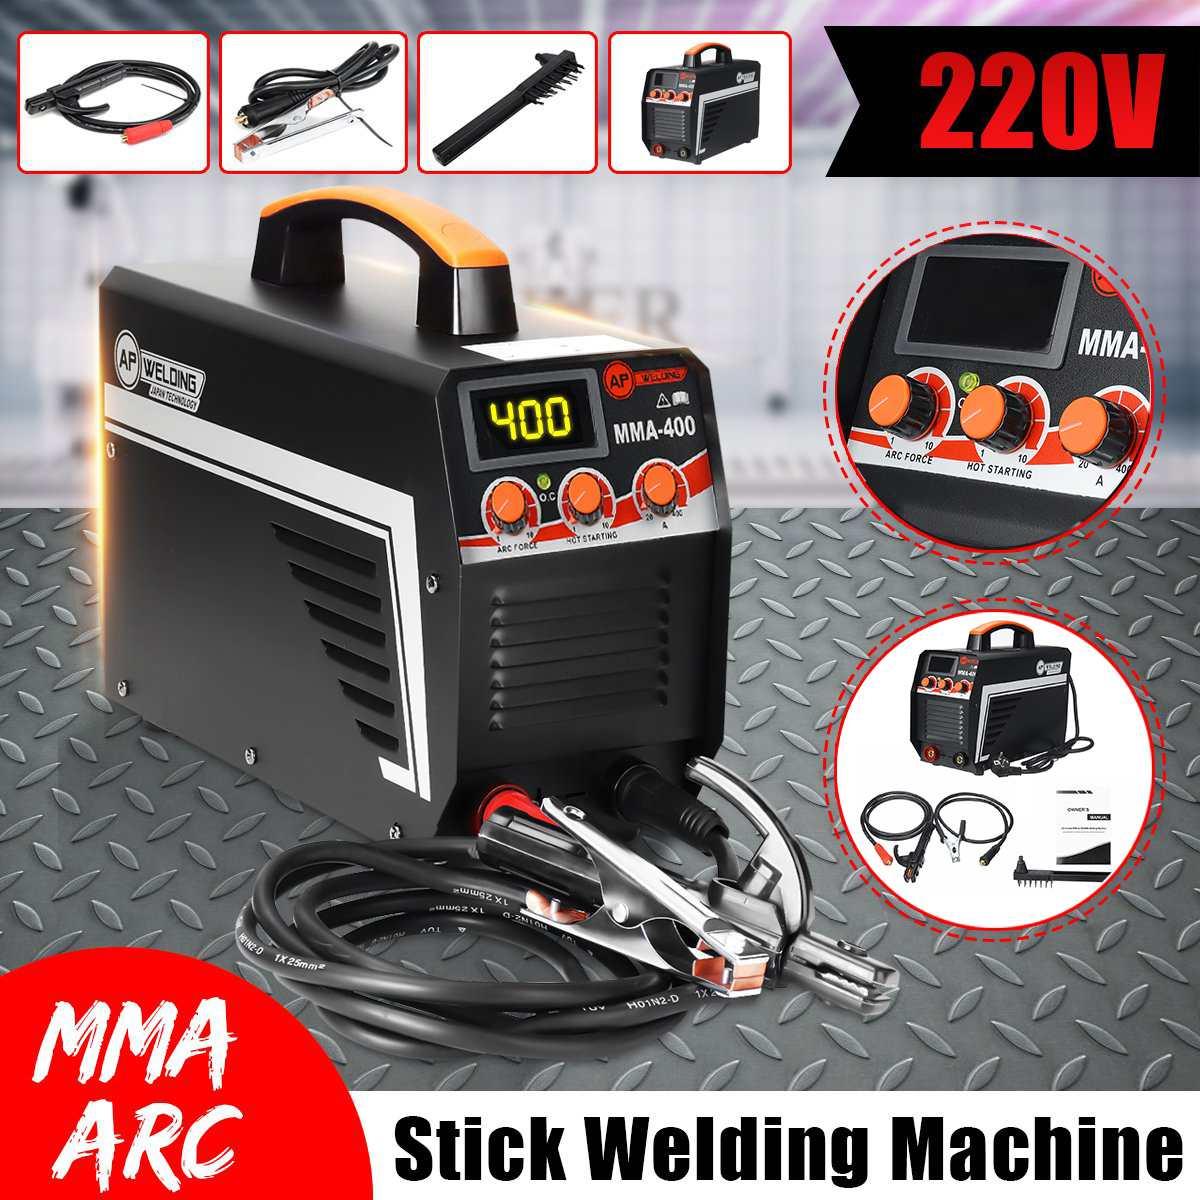 Arc Welder Electric Welding Machine IGBT Inverter Digital Display Portable Mini Arc Welding Machine Welder 220V Welding Tools